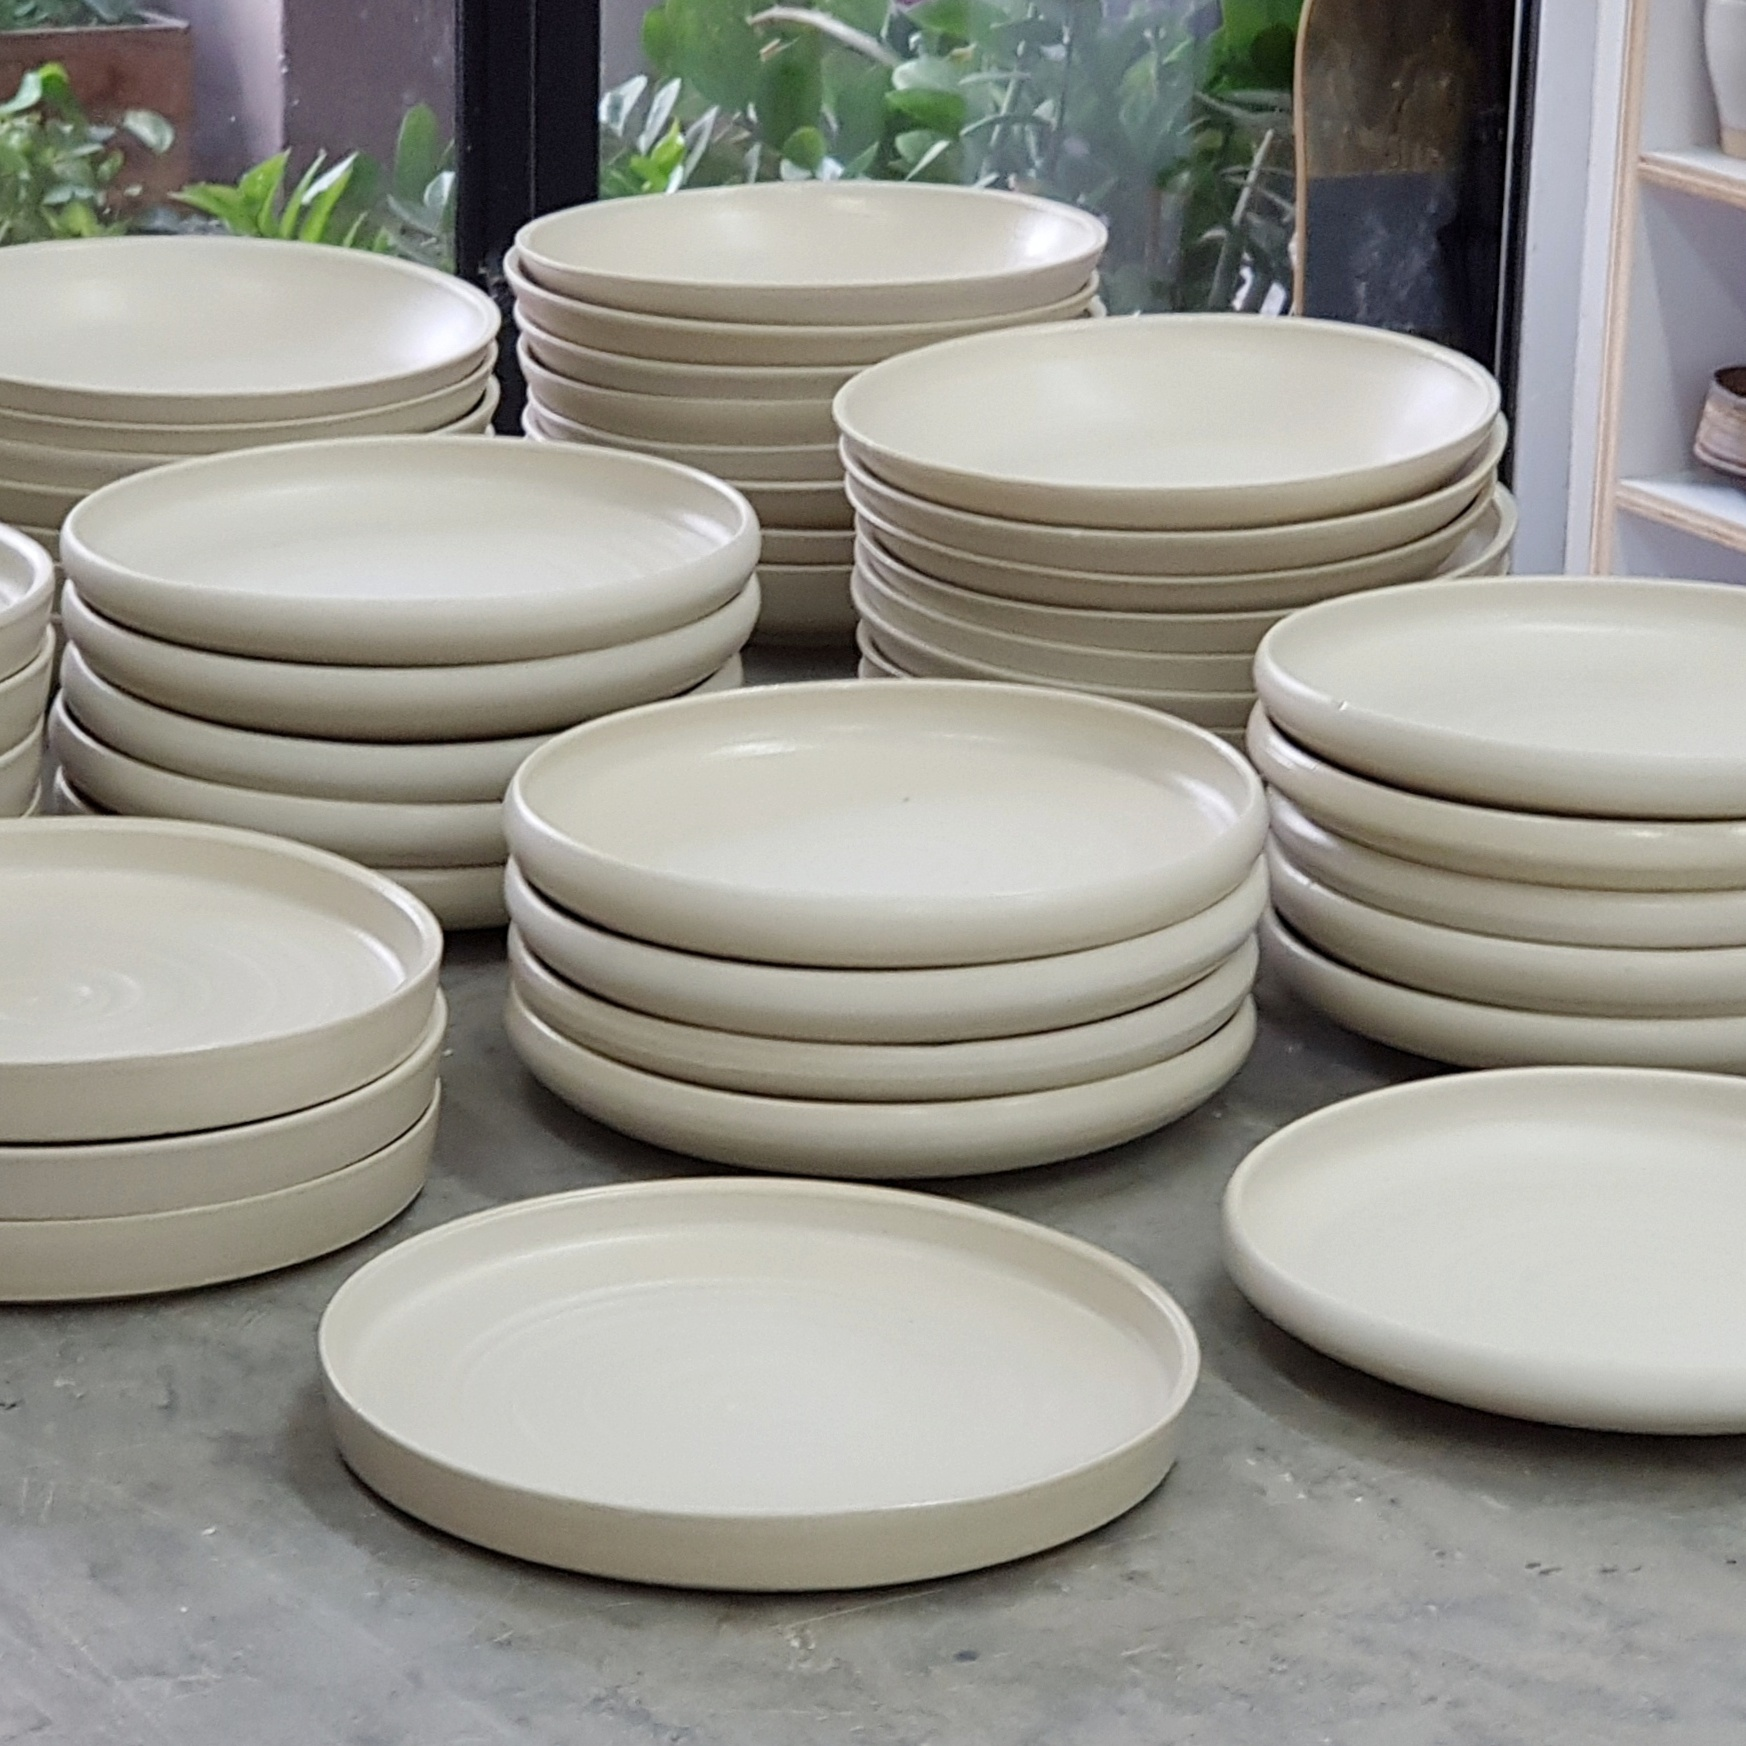 Wares for restaurant